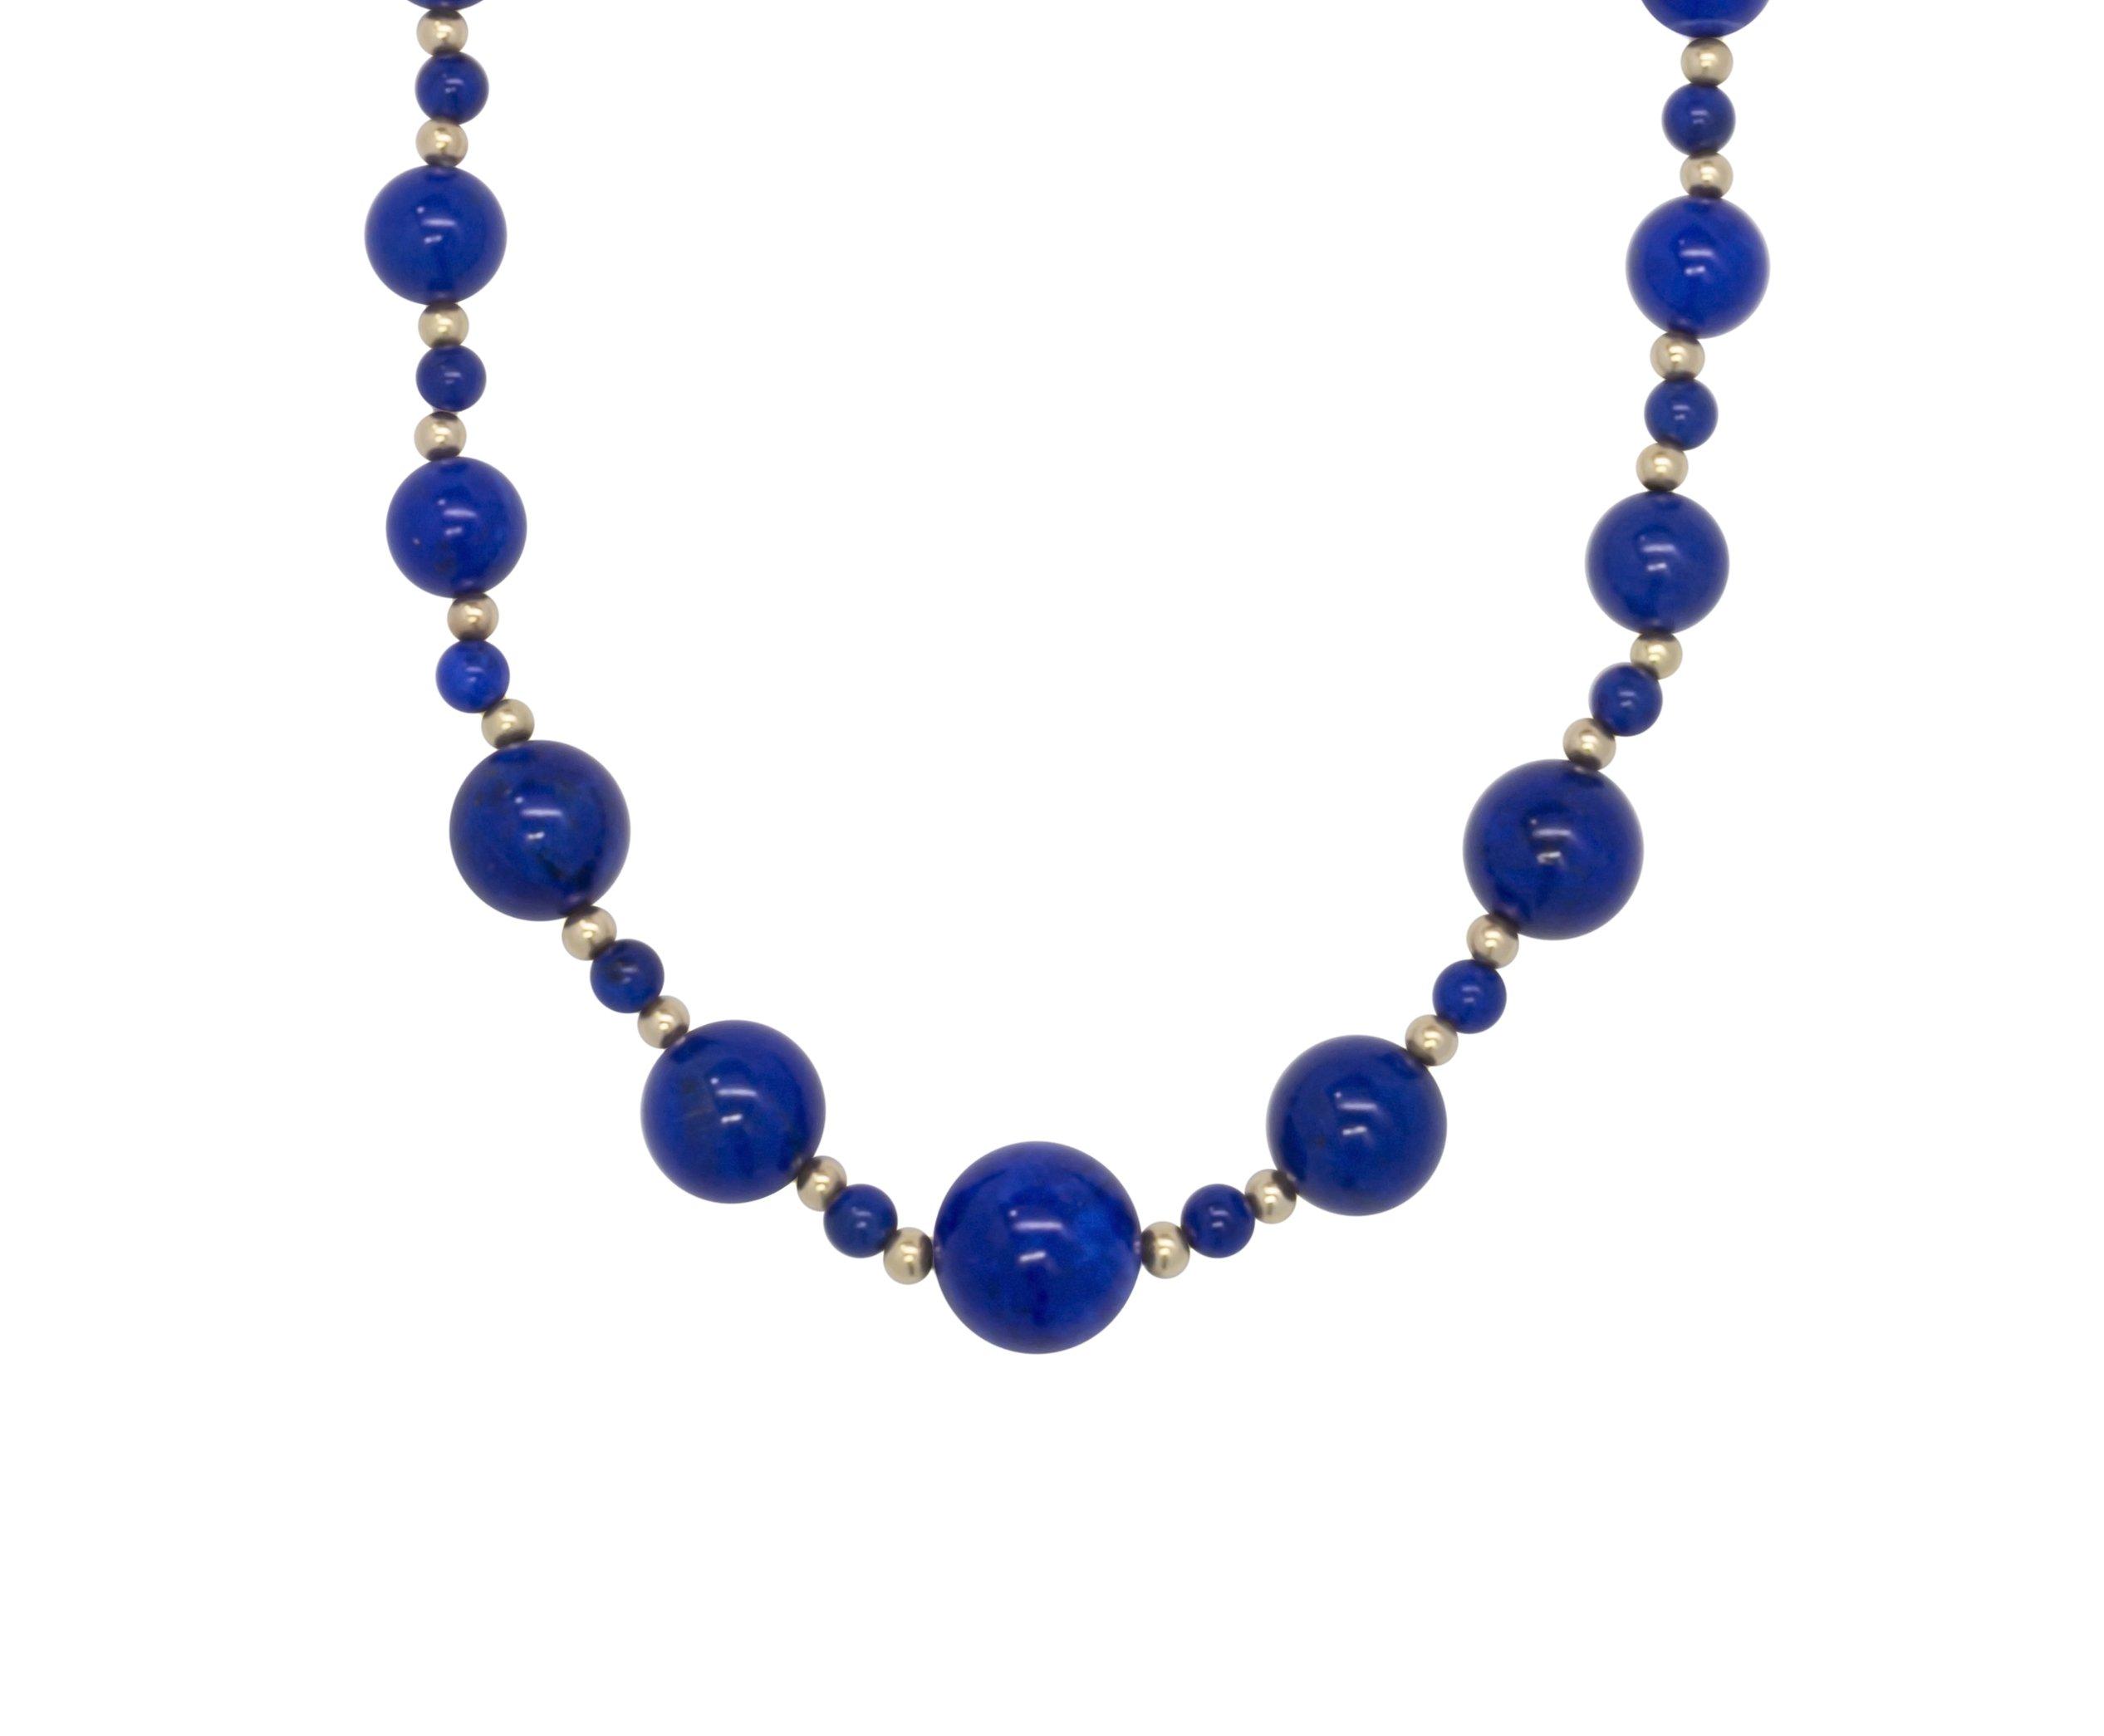 ISAAC WESTMAN 14K Yellow Gold Graduated Lapis Lazuli Gemstone Beaded Necklace | 20'' Matinee Length by ISAAC WESTMAN (Image #1)